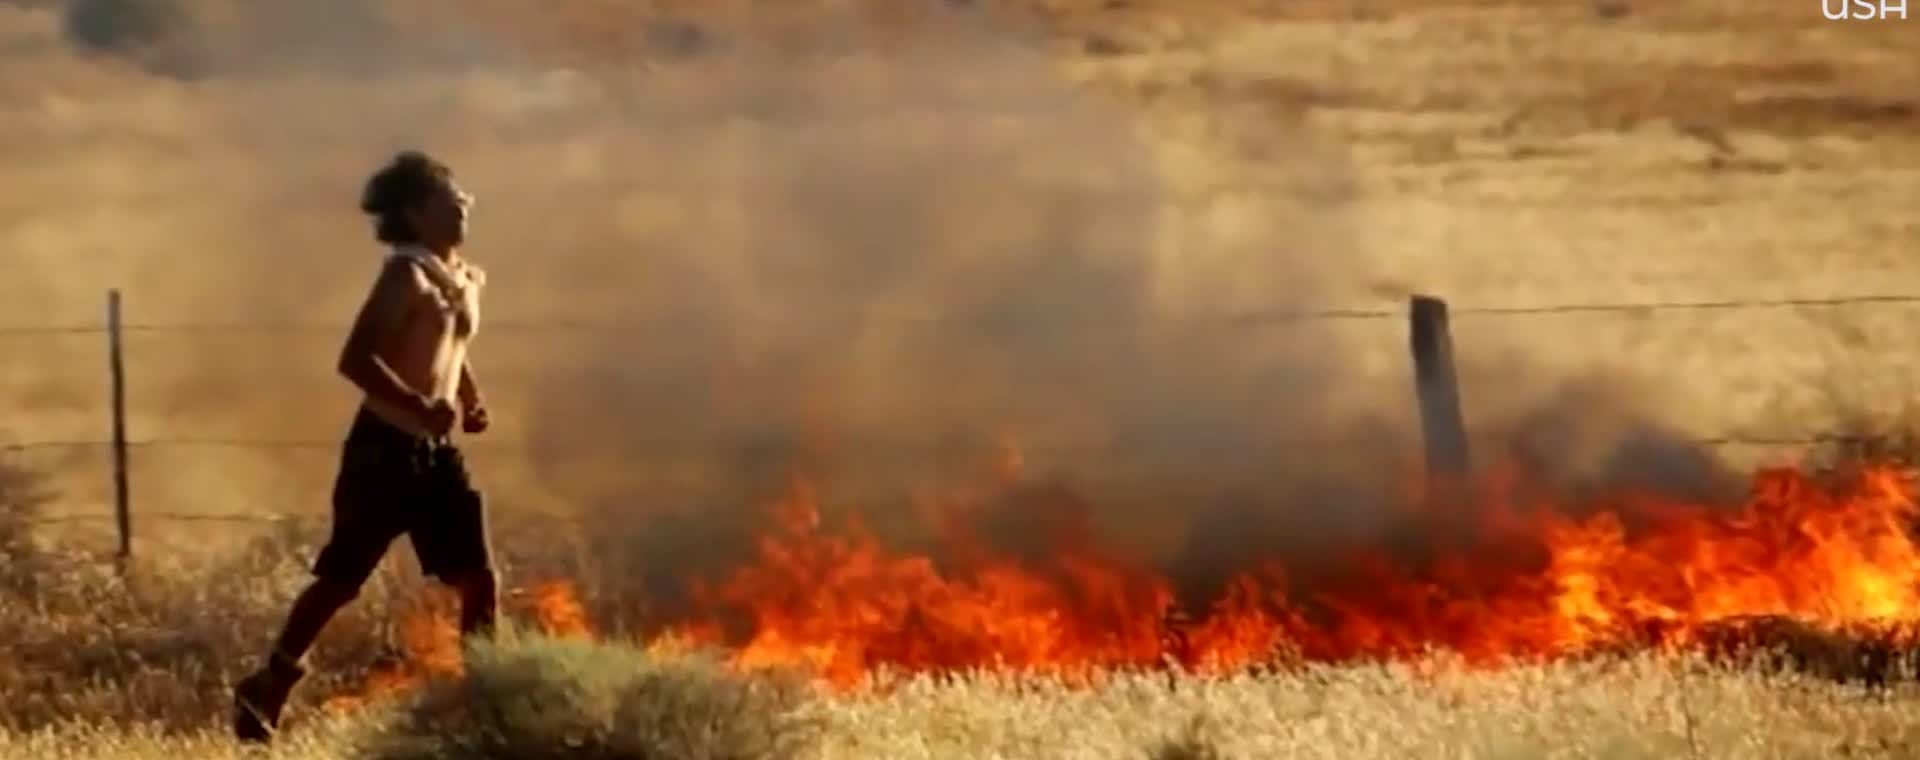 Oregon Wildfires Conspiracies